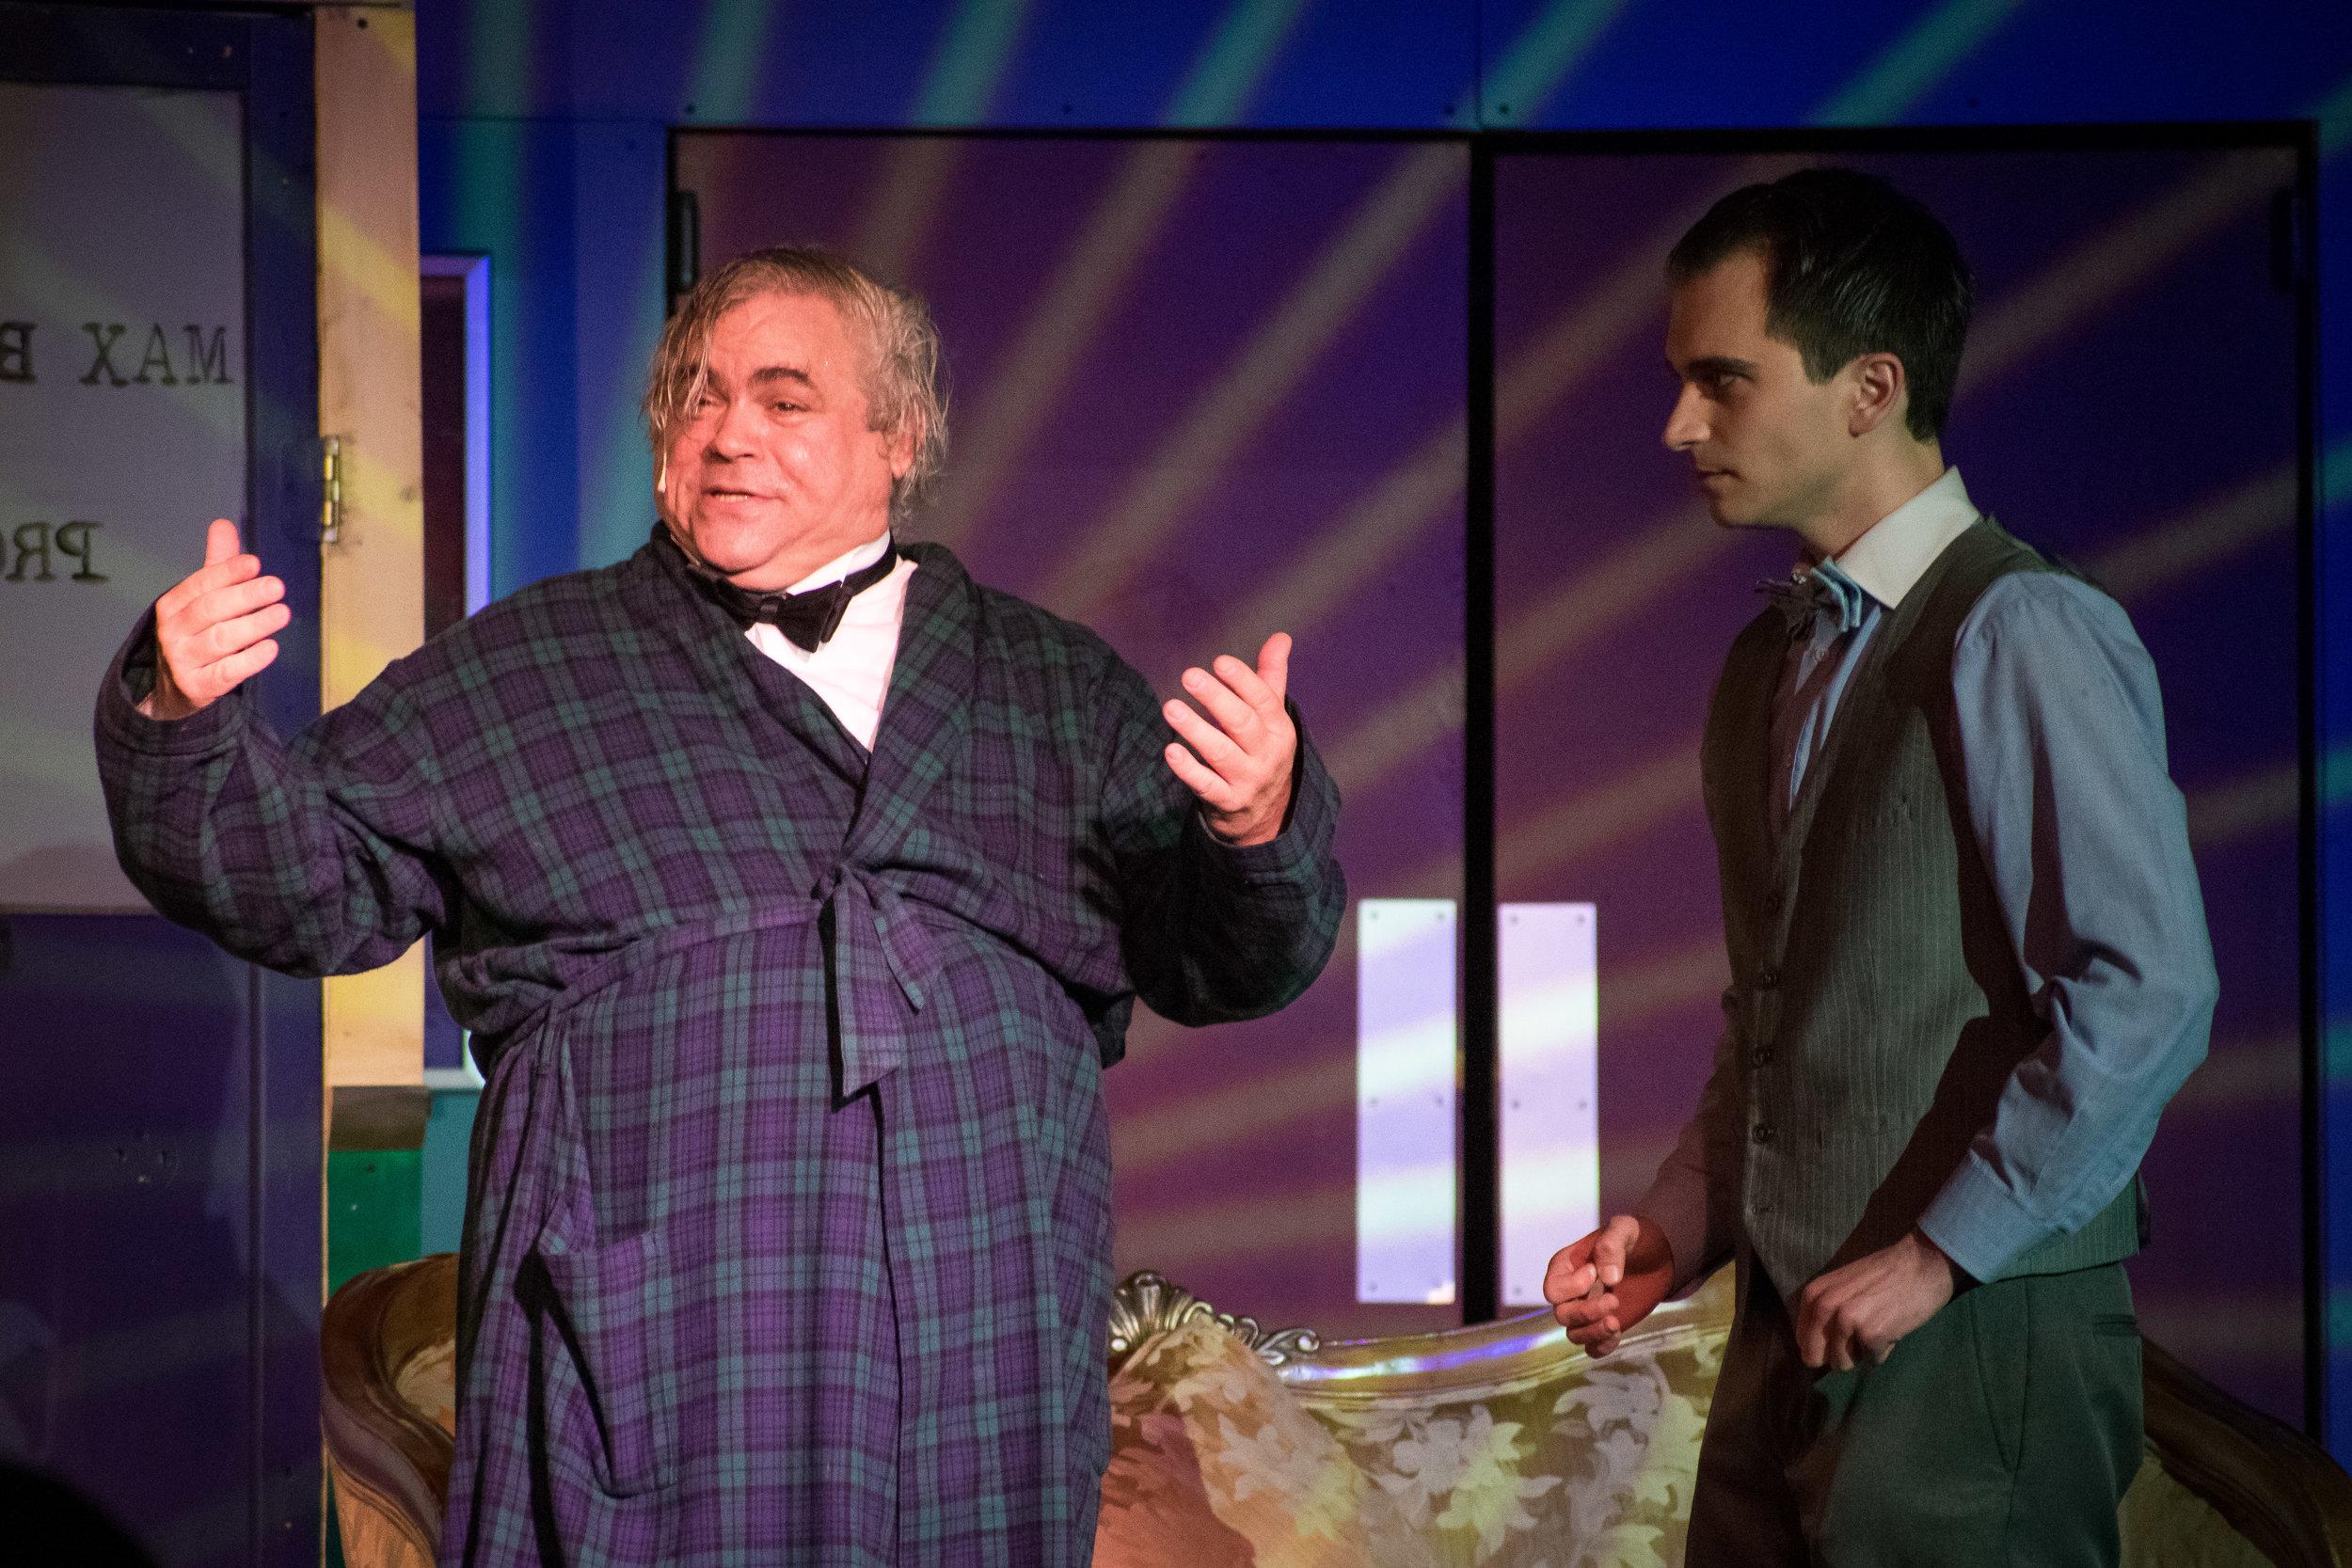 B. Thomas Rinaldi (L) as Max Bialystock and Henry Cyr (R) as Leo Bloom